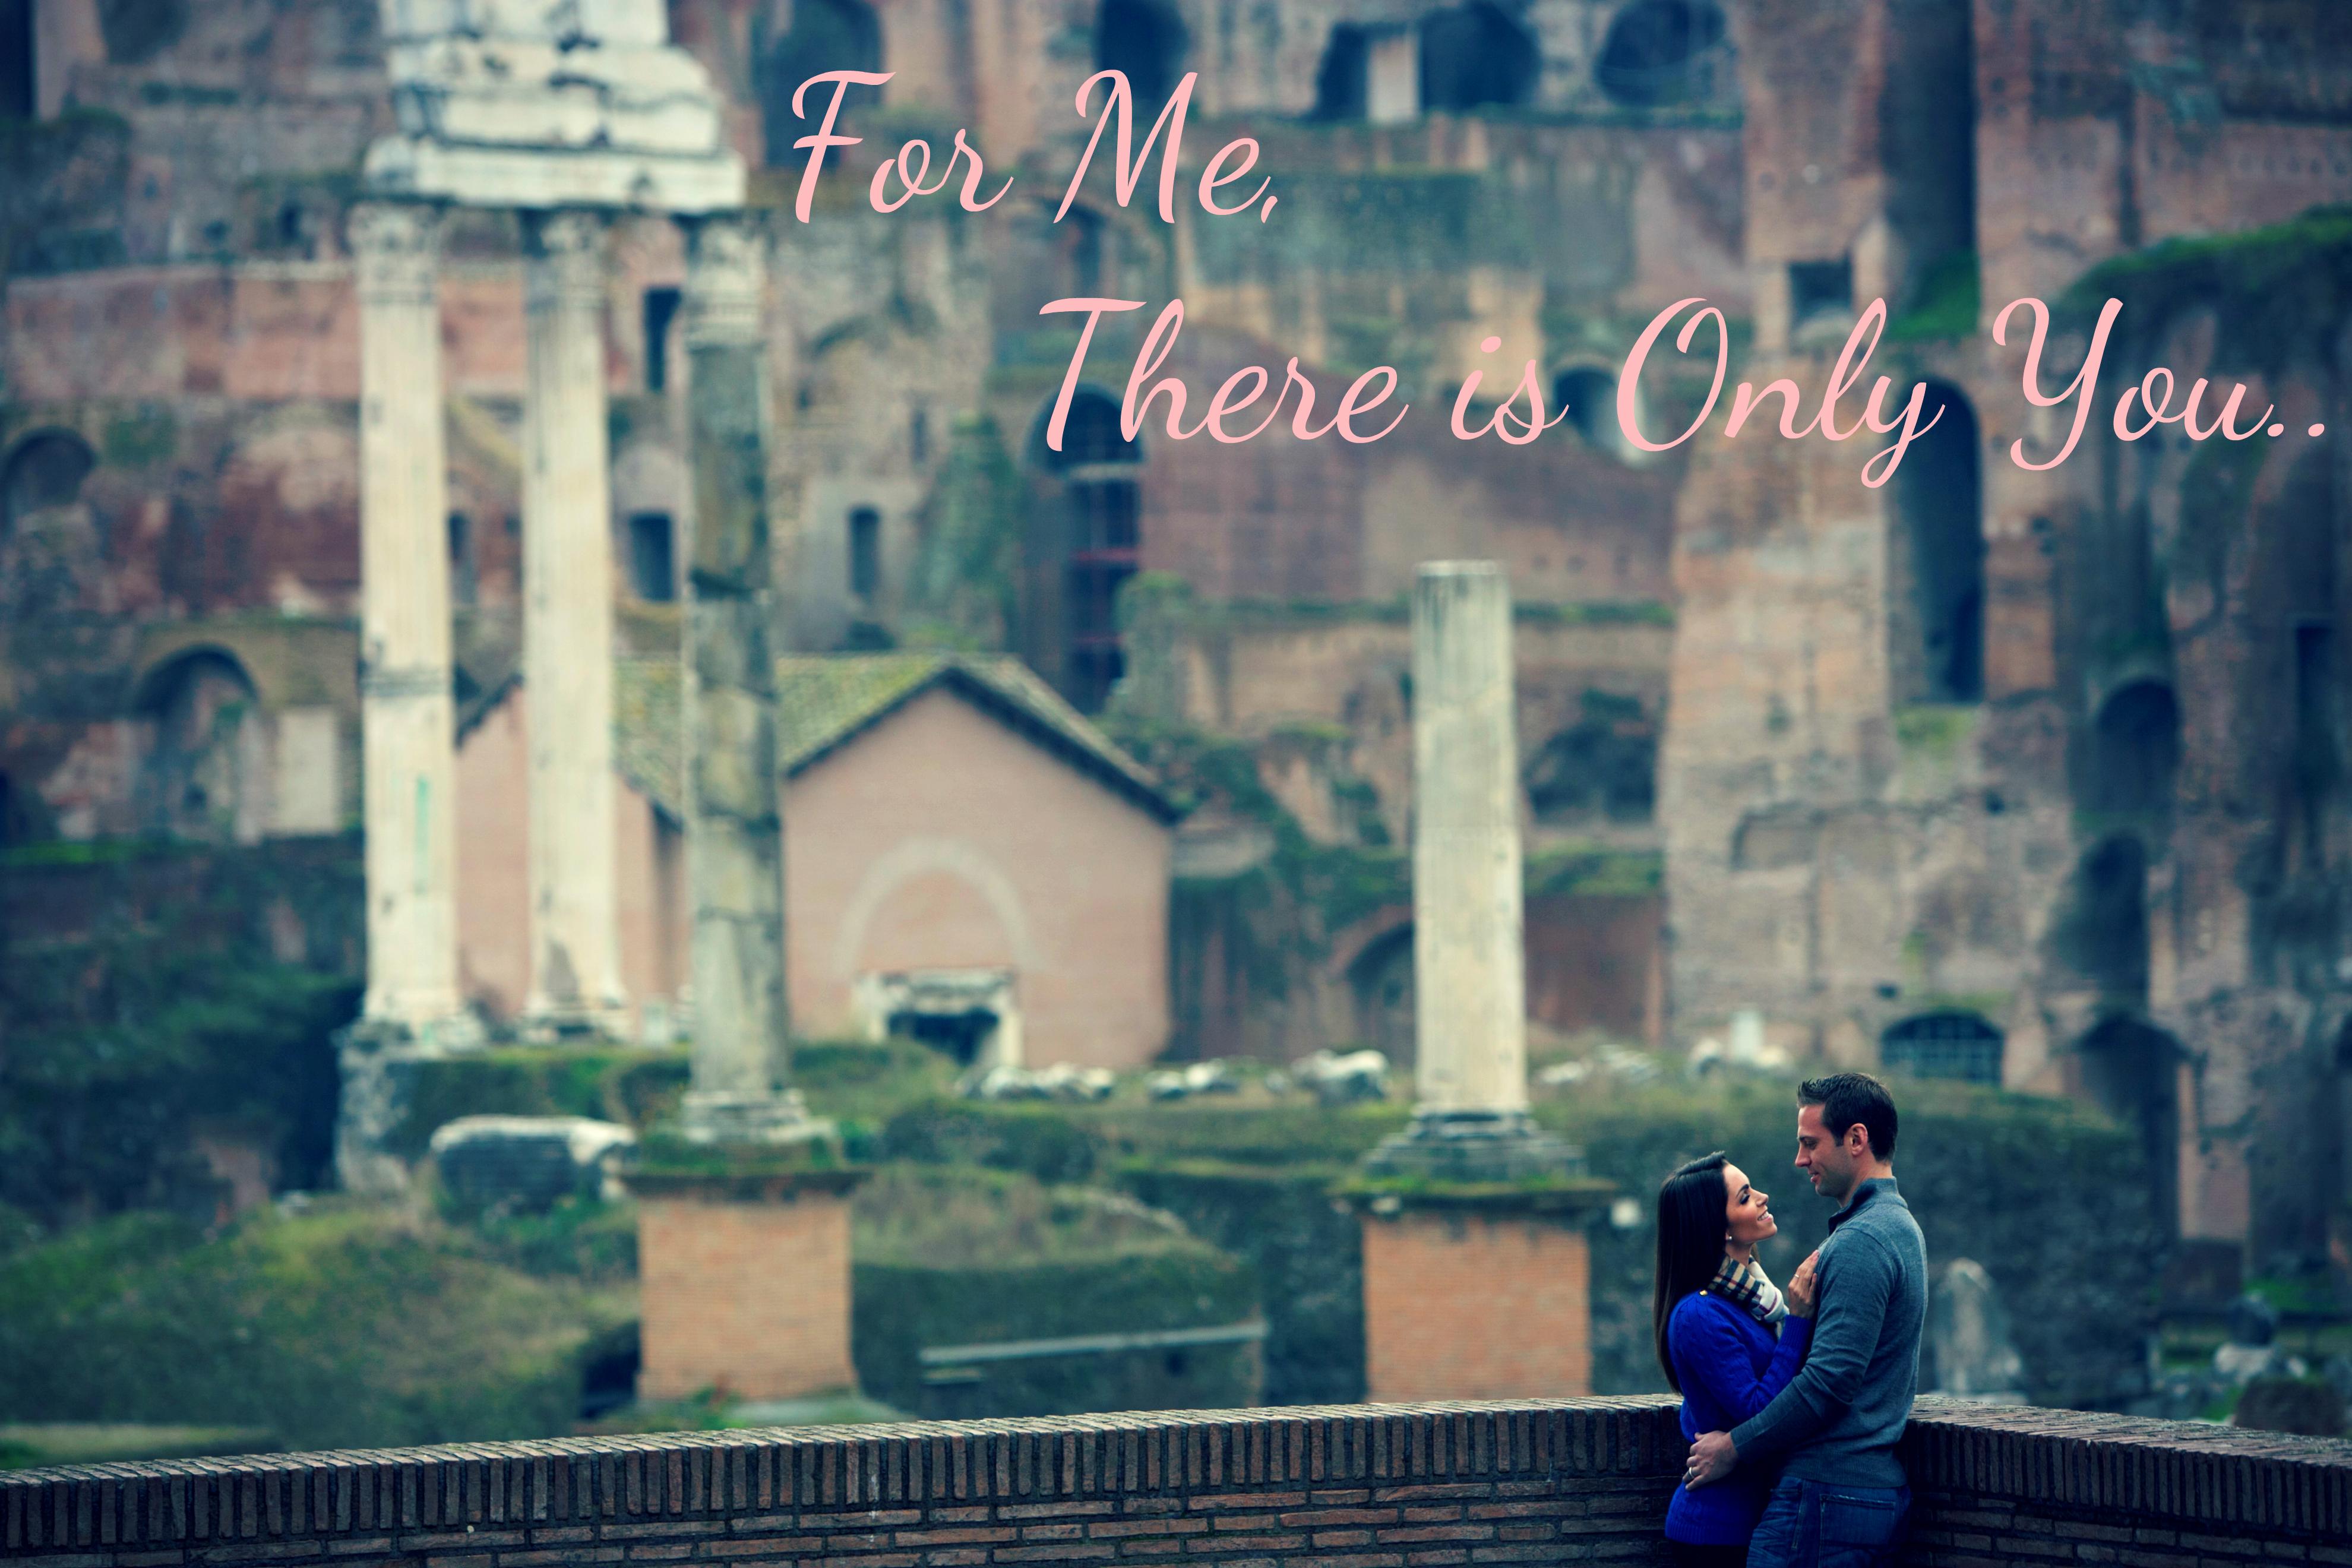 Rome Couples Photo Shoot. Rome Photography. Lifefrosting.com